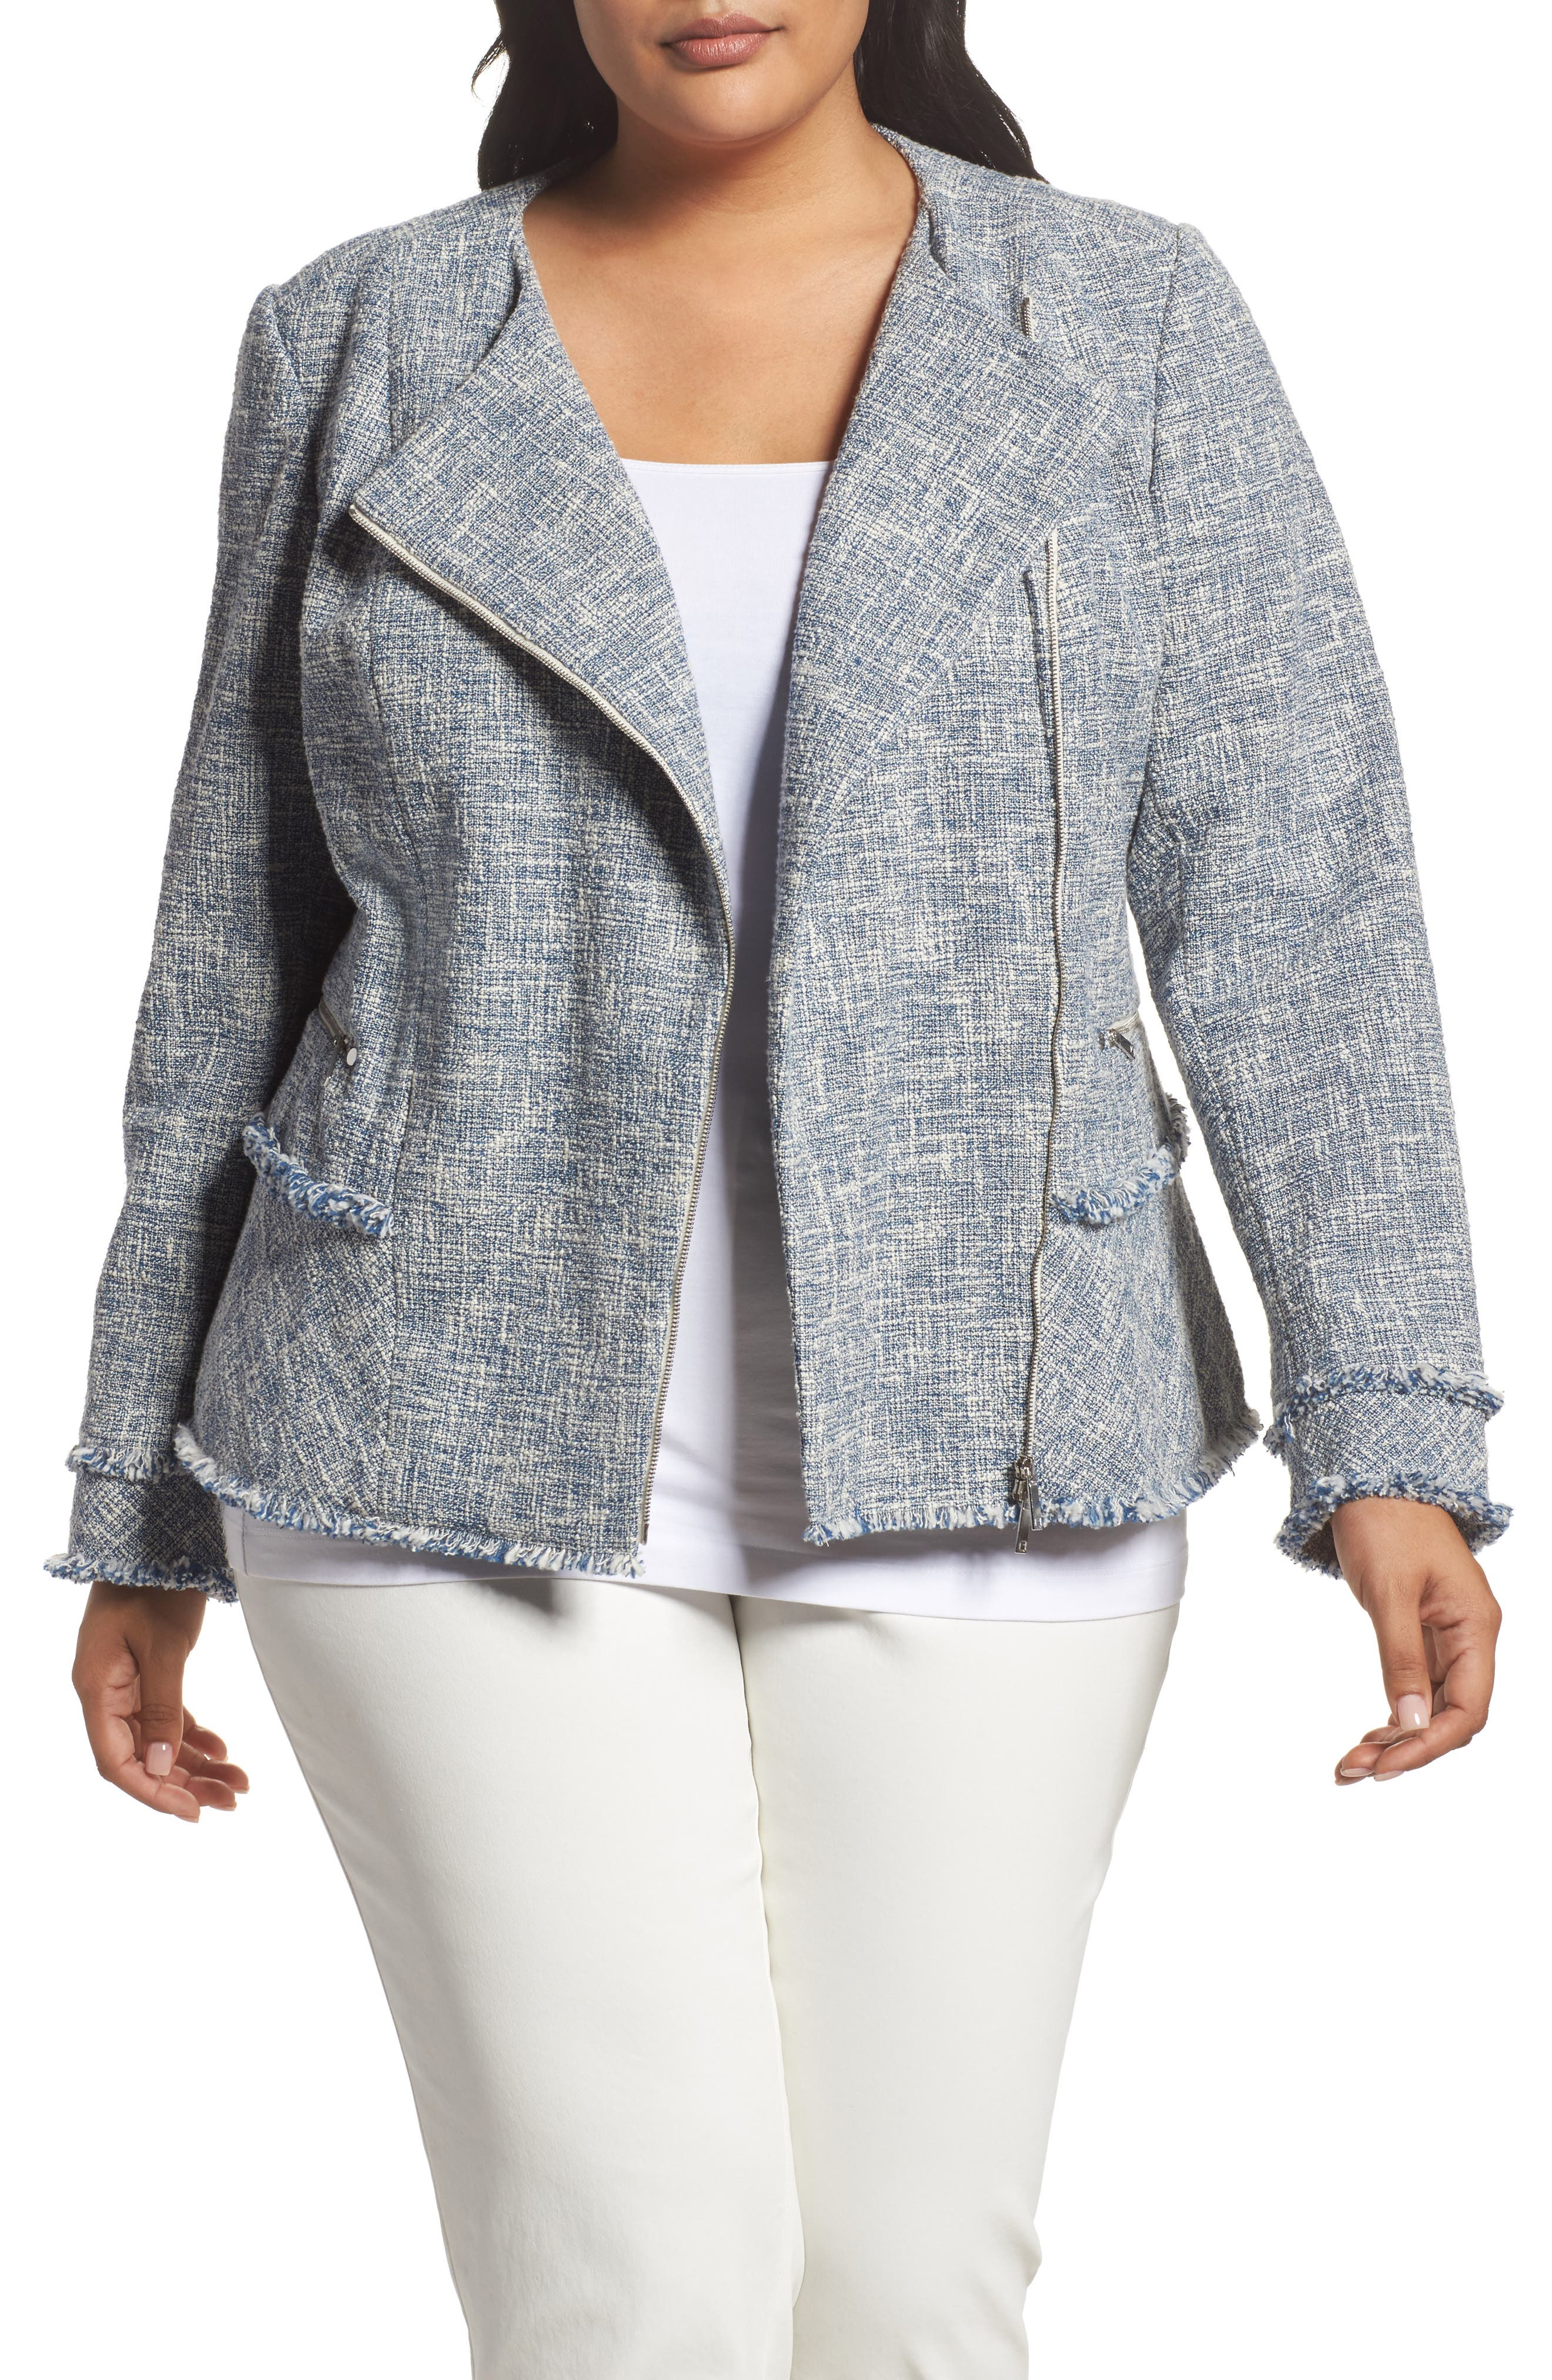 Alternate Image 1 Selected - Lafayette 148 New York Owen Tweed Jacket (Plus Size)